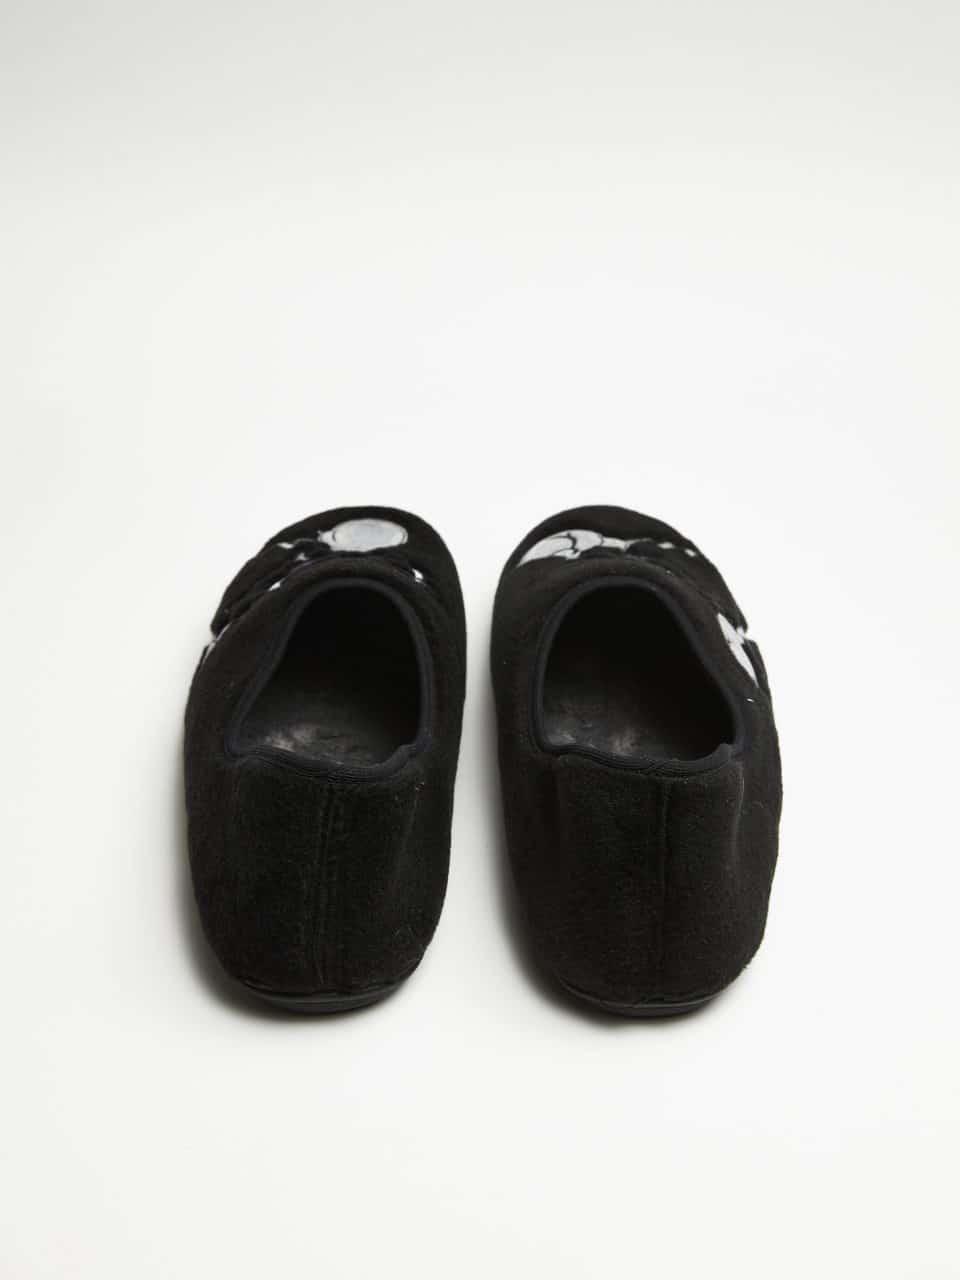 MONTBLANC NEGRO Marcas en Loyna Shoes